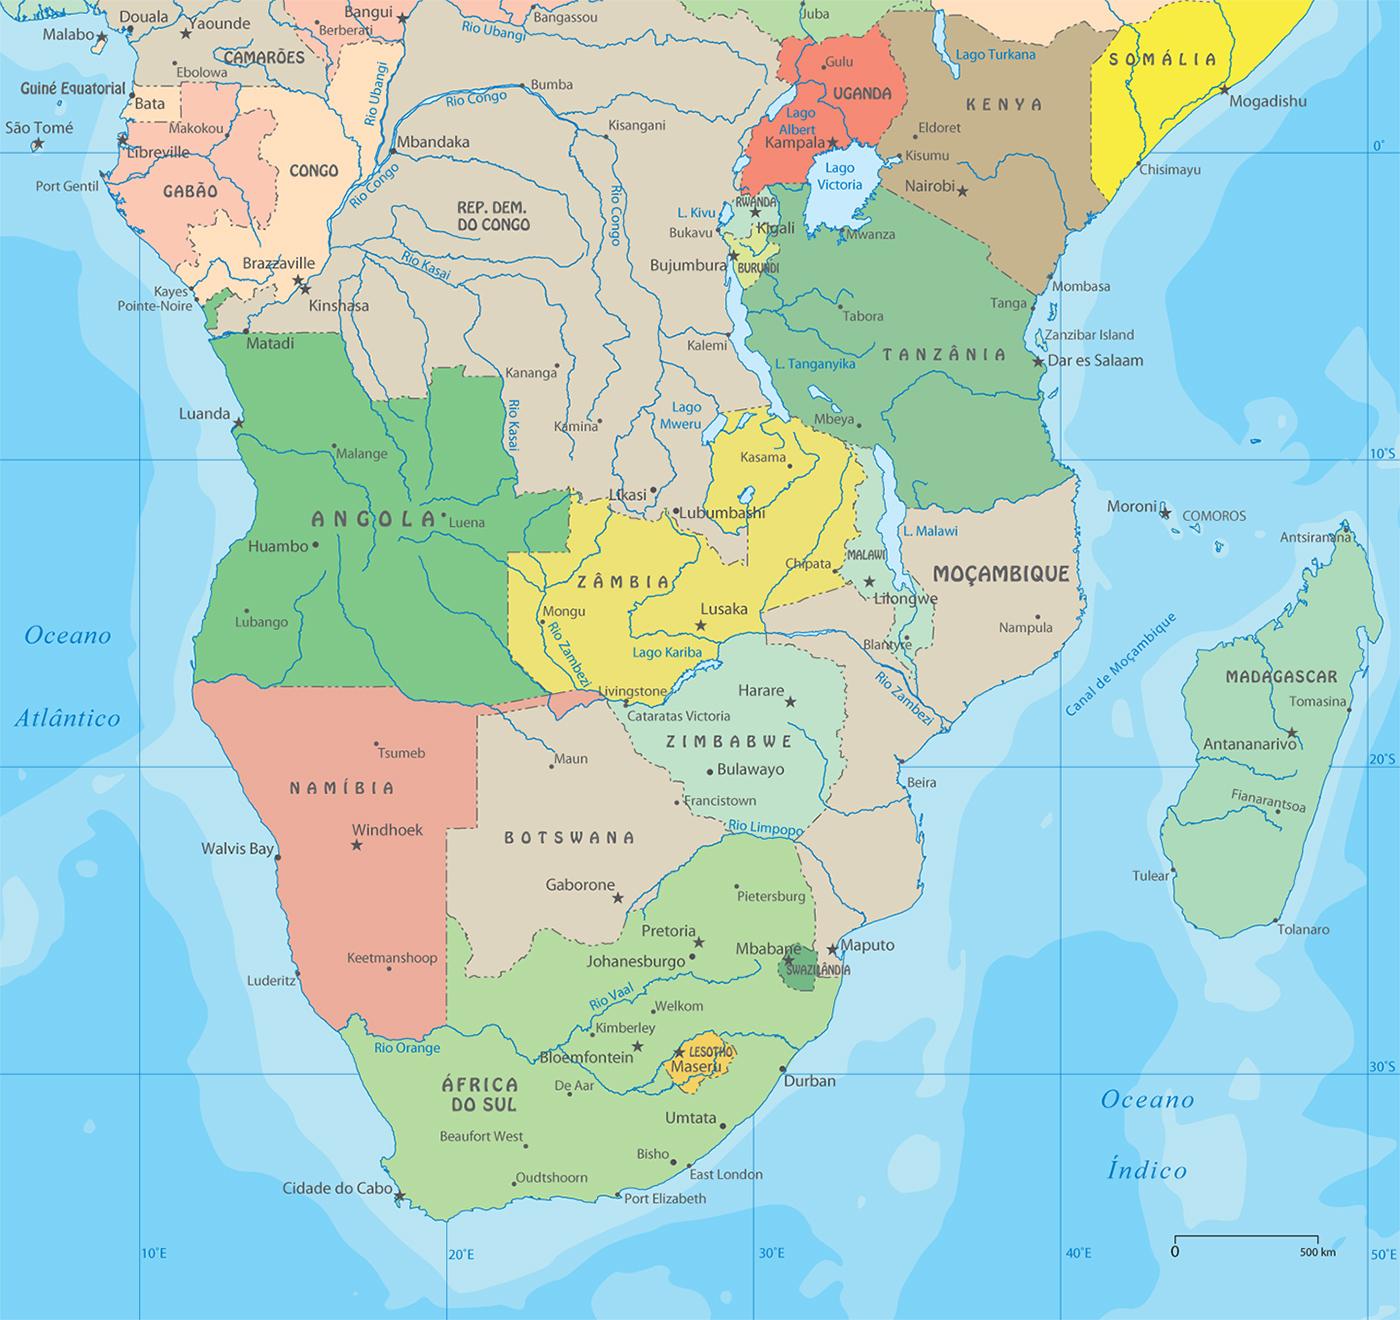 Mapa Poltico do Sul da frica